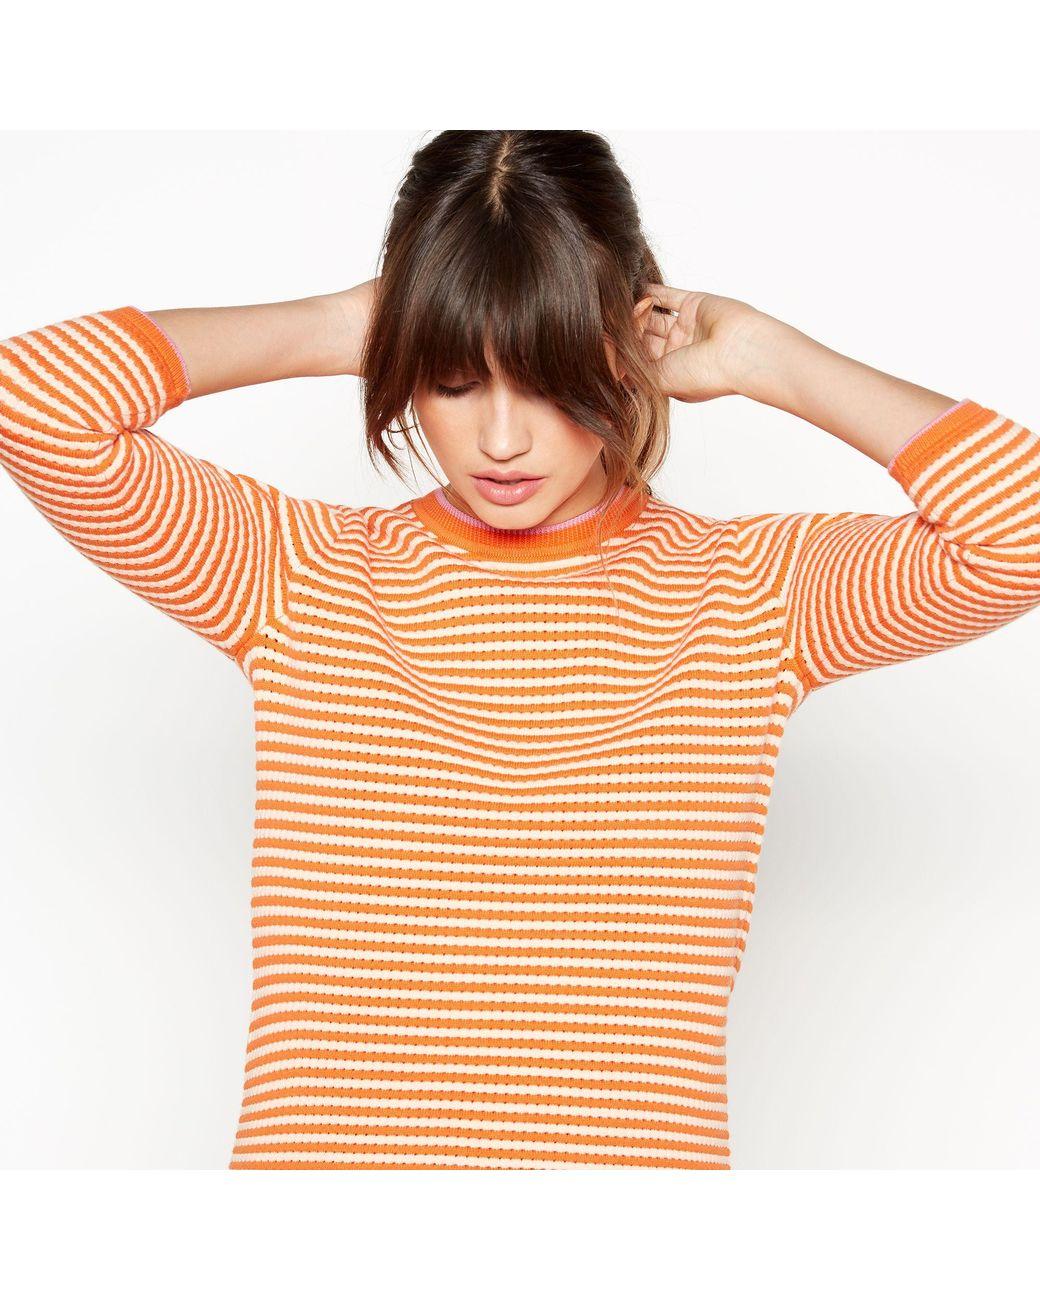 9f9d3bde286ddb J By Jasper Conran Orange Striped Cotton Jumper in Orange - Lyst